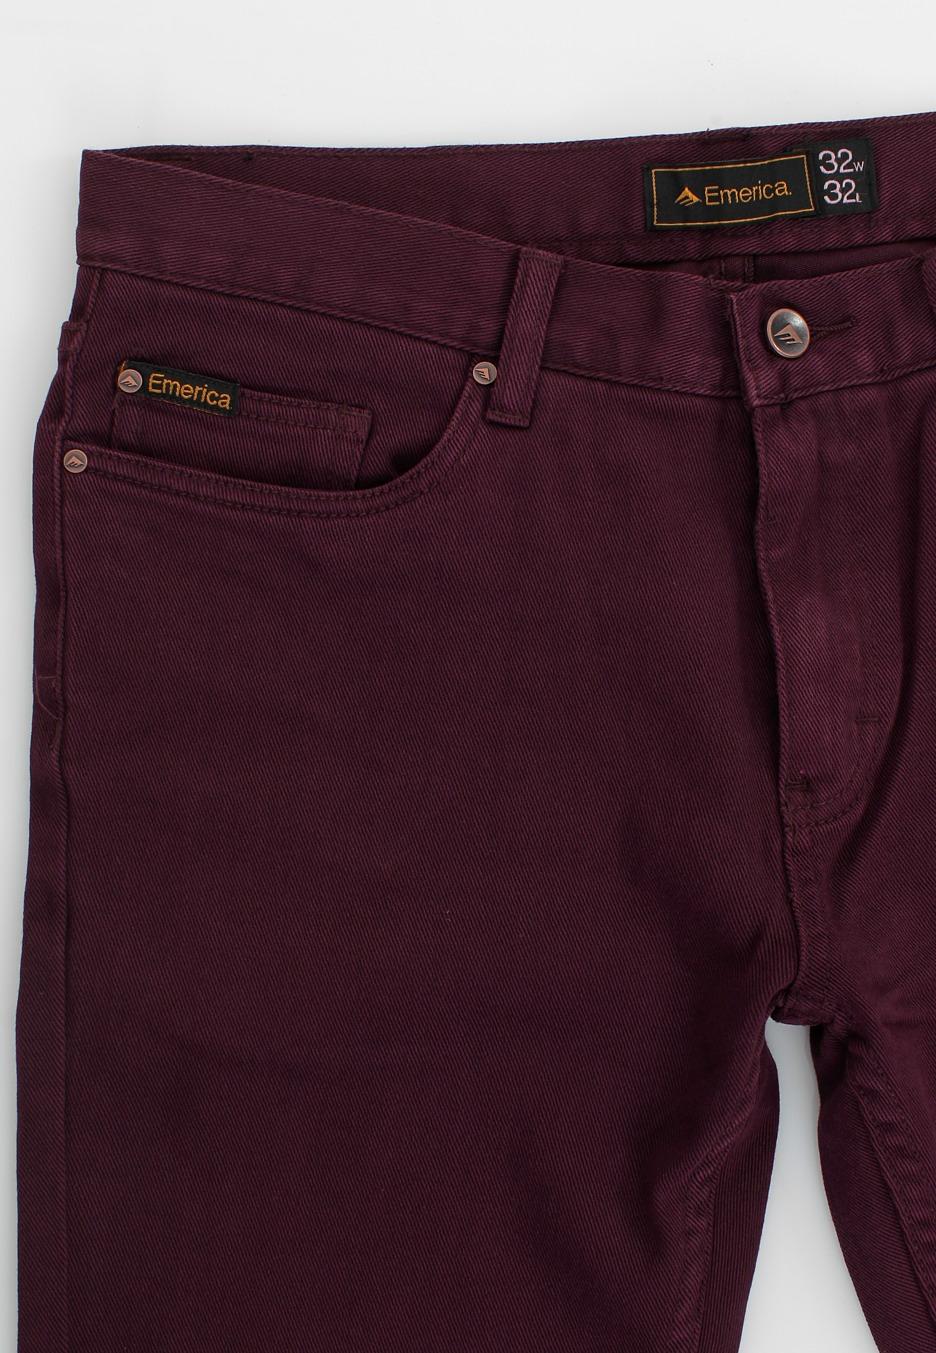 emerica selma denim burgundy jeans streetwear shop de. Black Bedroom Furniture Sets. Home Design Ideas